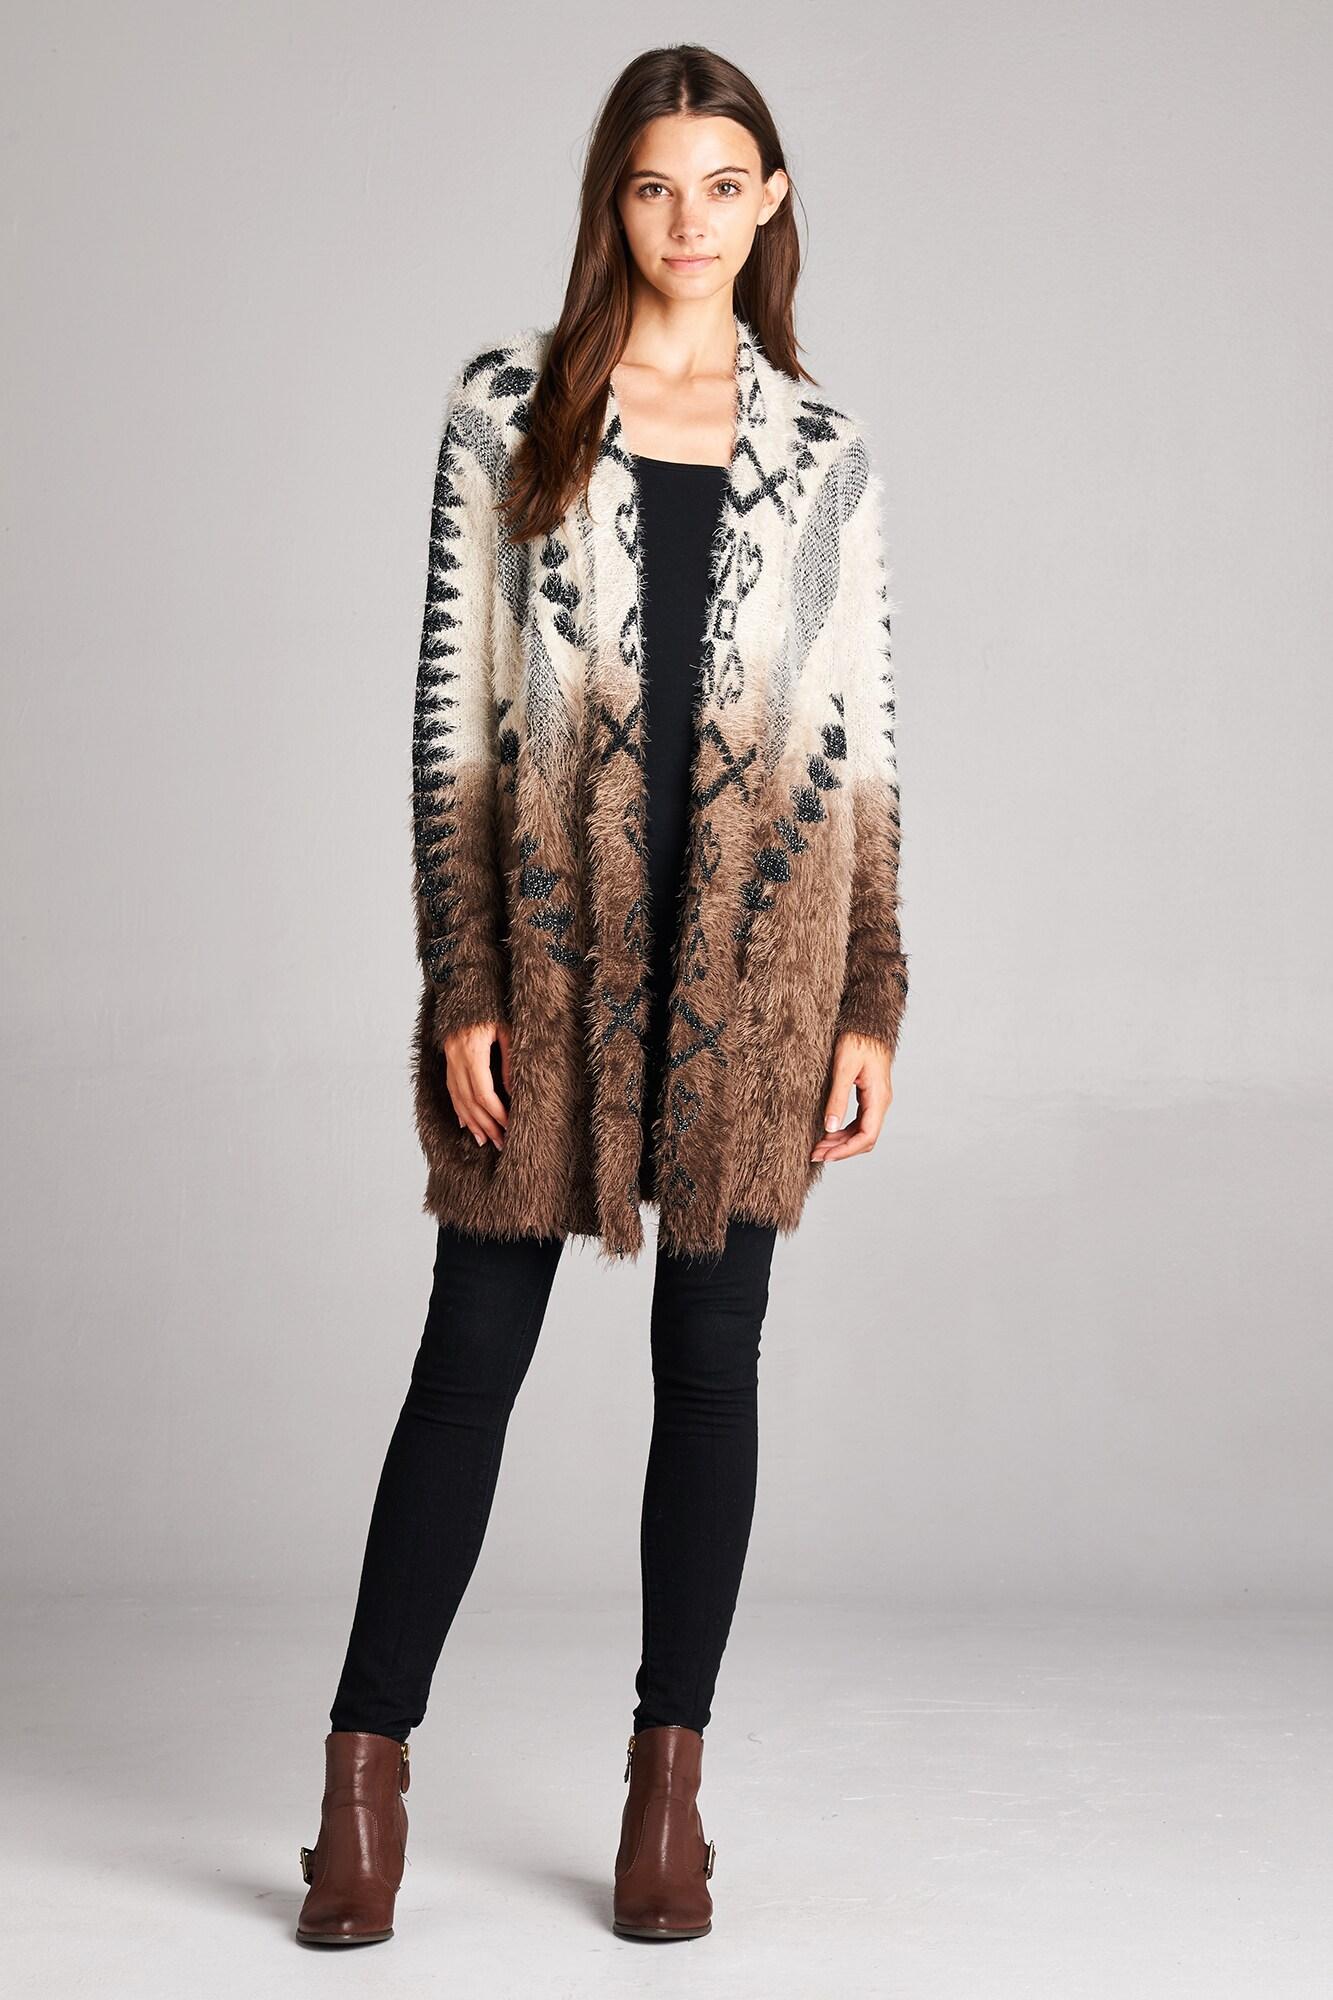 Orange Creek Fuzzy Ombre Acrylic/Nylon Long-sleeved Cardigan